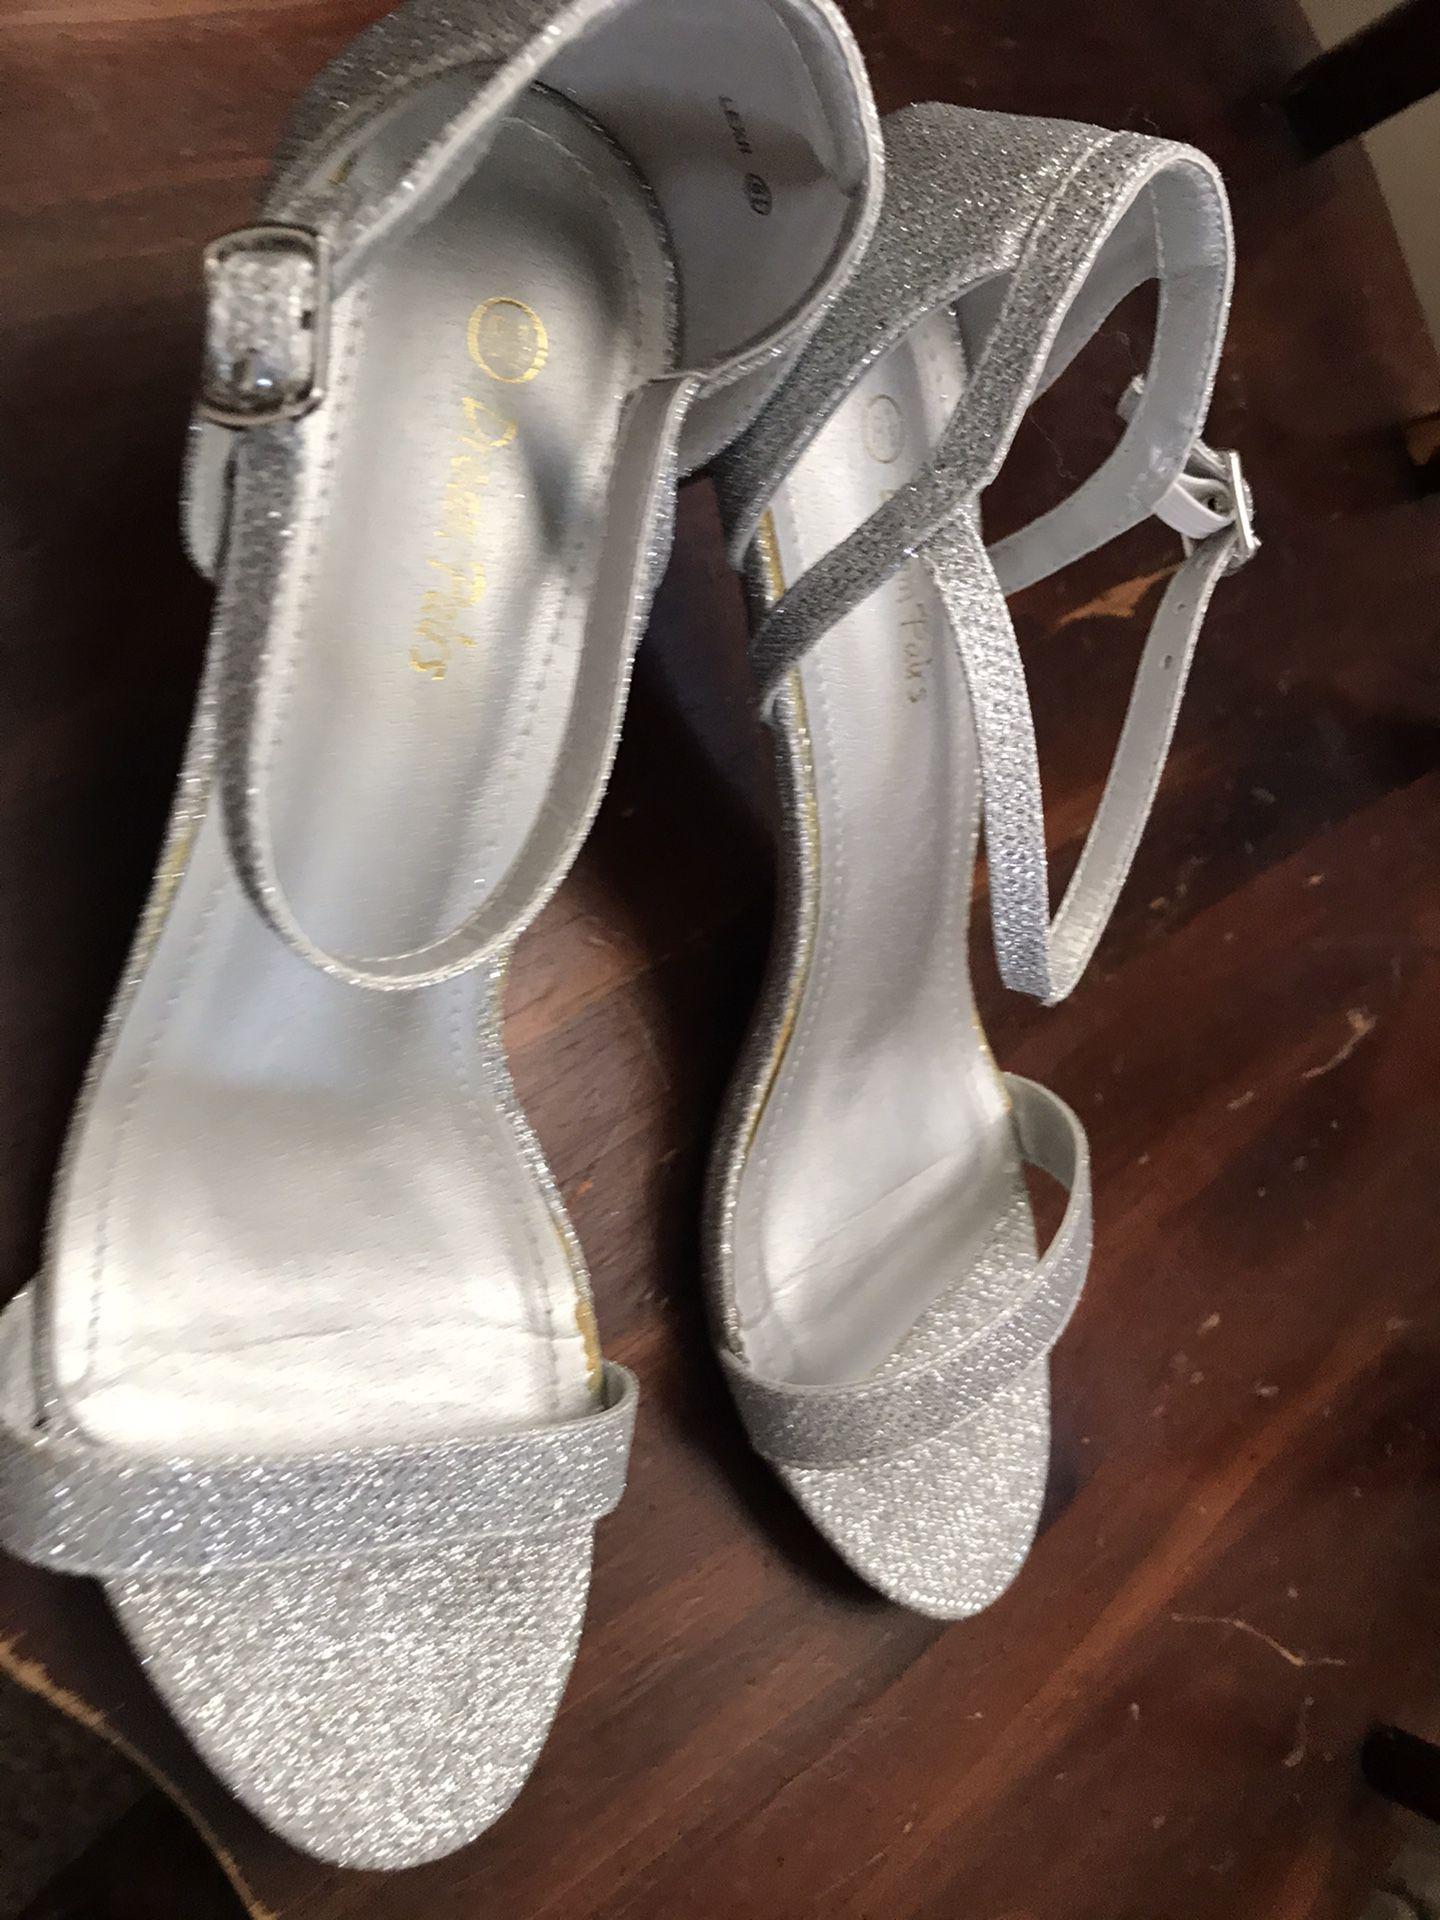 Silver Size 8.5 Women's Shoes